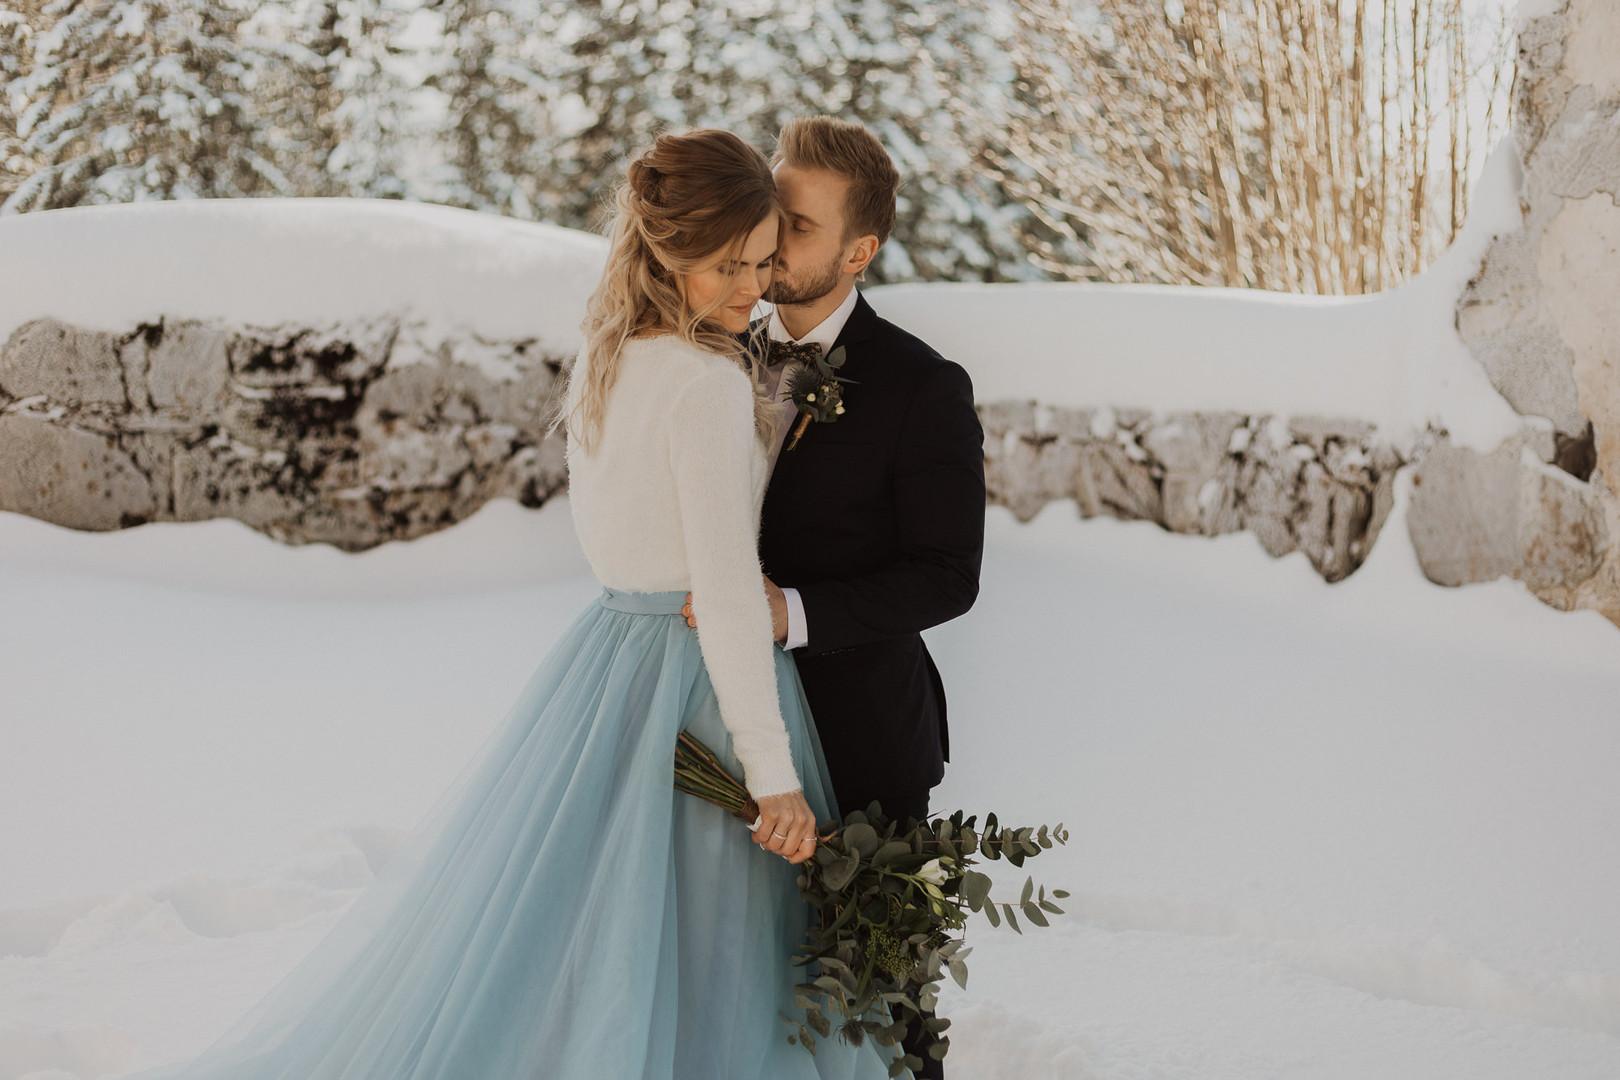 Vinterbröllop Jämtland